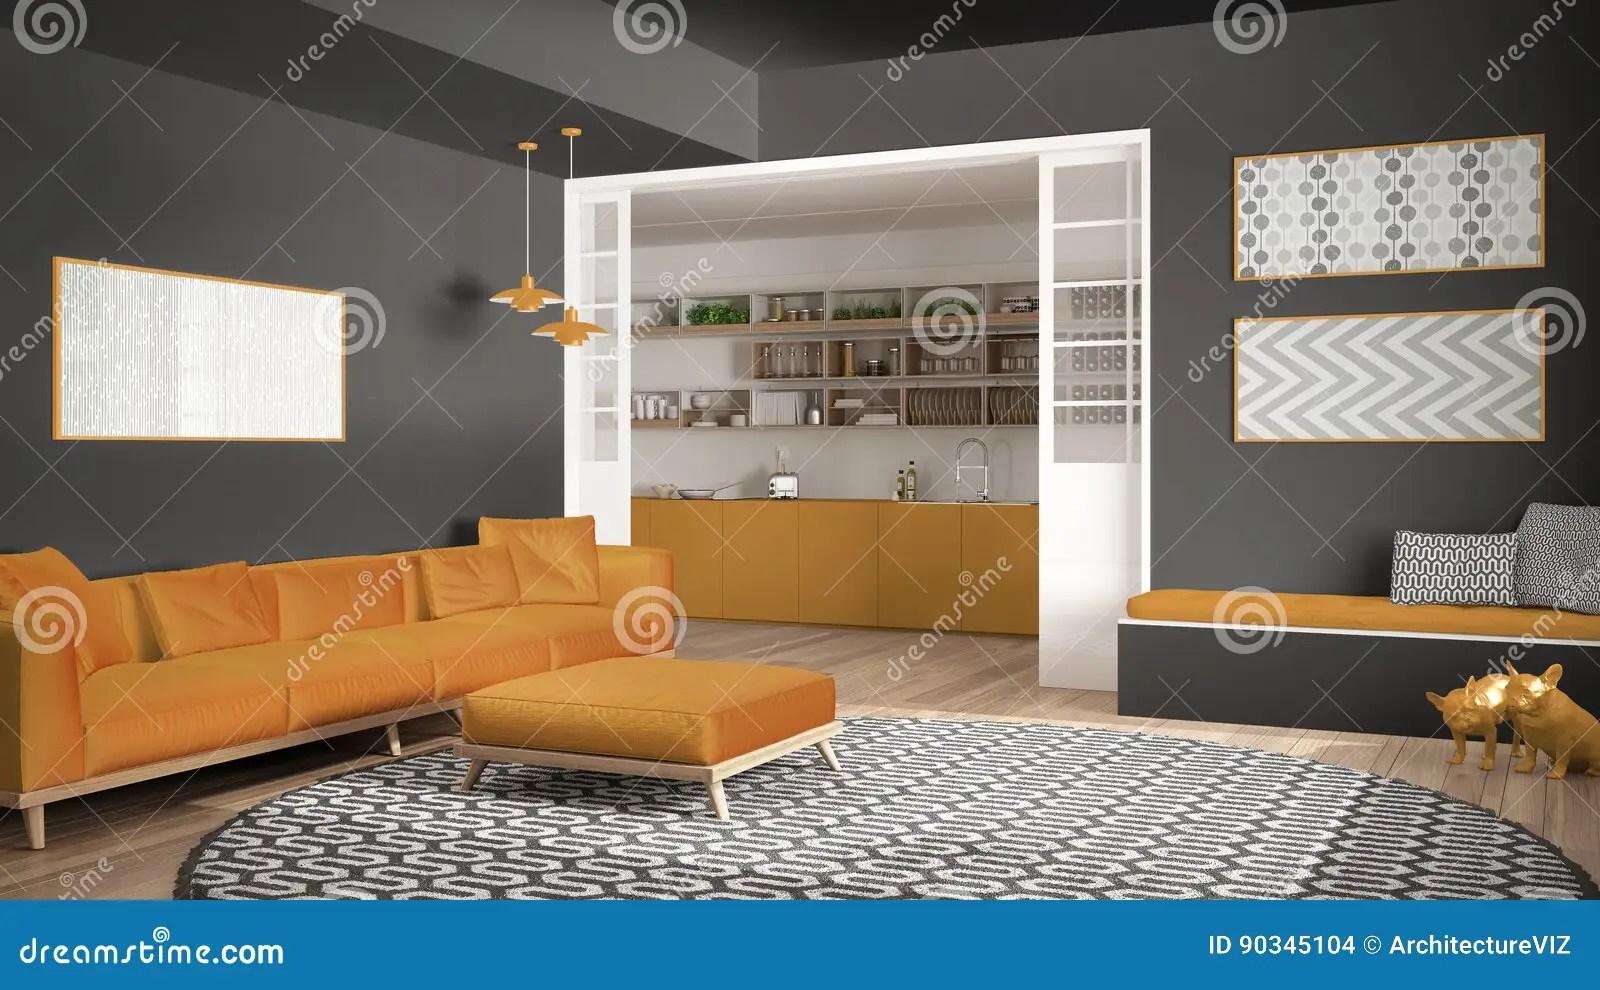 yellow kitchen rugs fan cover 有沙发 大圆的地毯和厨房的最低纲领派客厅我库存例证 插画包括有行家 大圆的地毯和厨房的最低纲领派客厅背景 灰色和黄色现代室内设计的